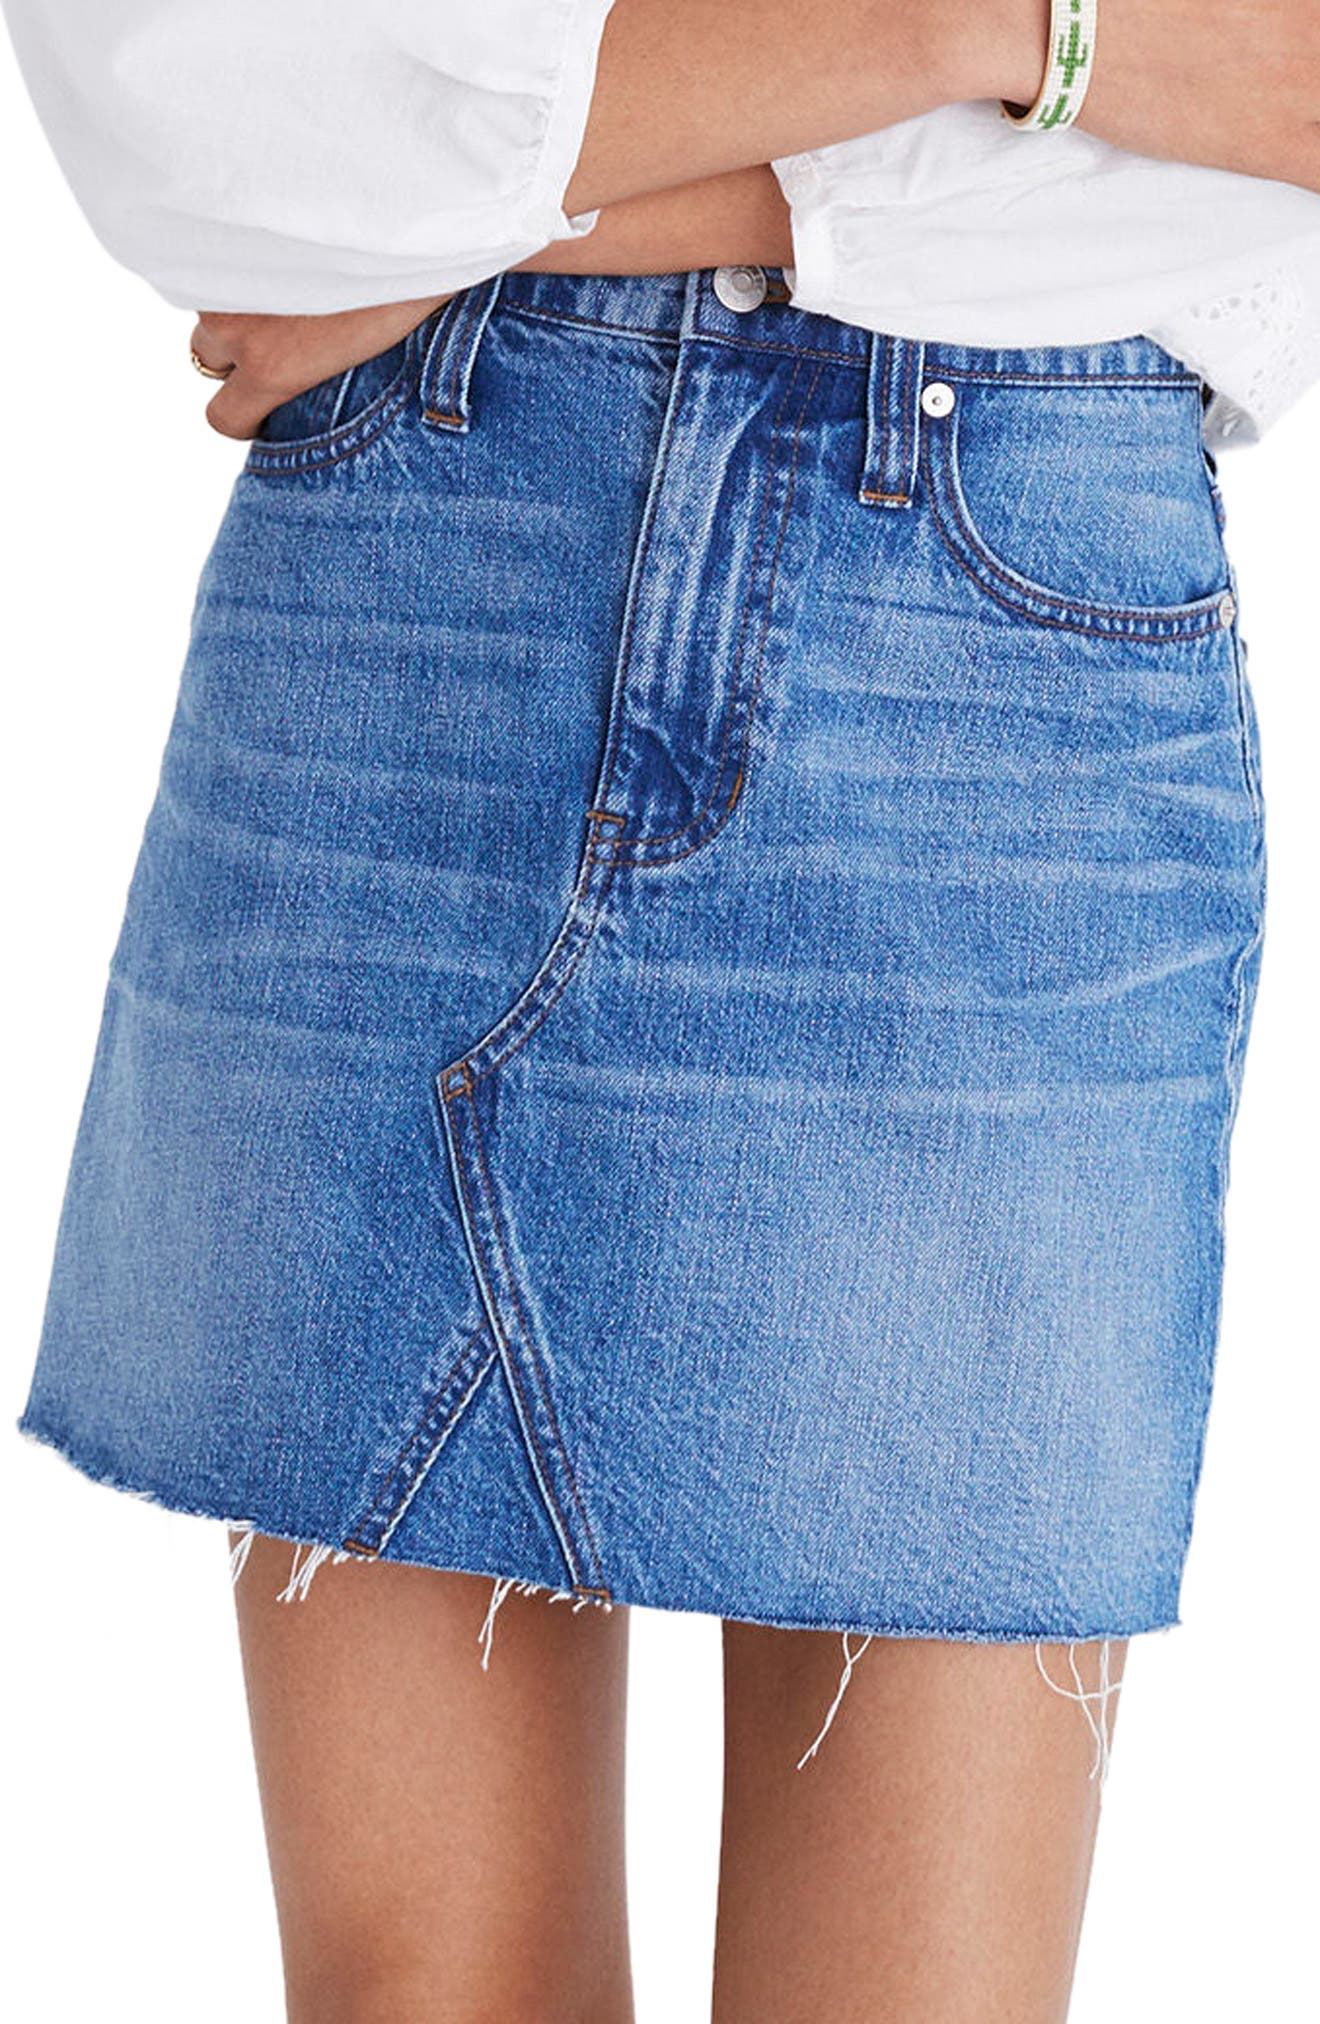 Frisco Denim Miniskirt,                         Main,                         color, Leandra Wash